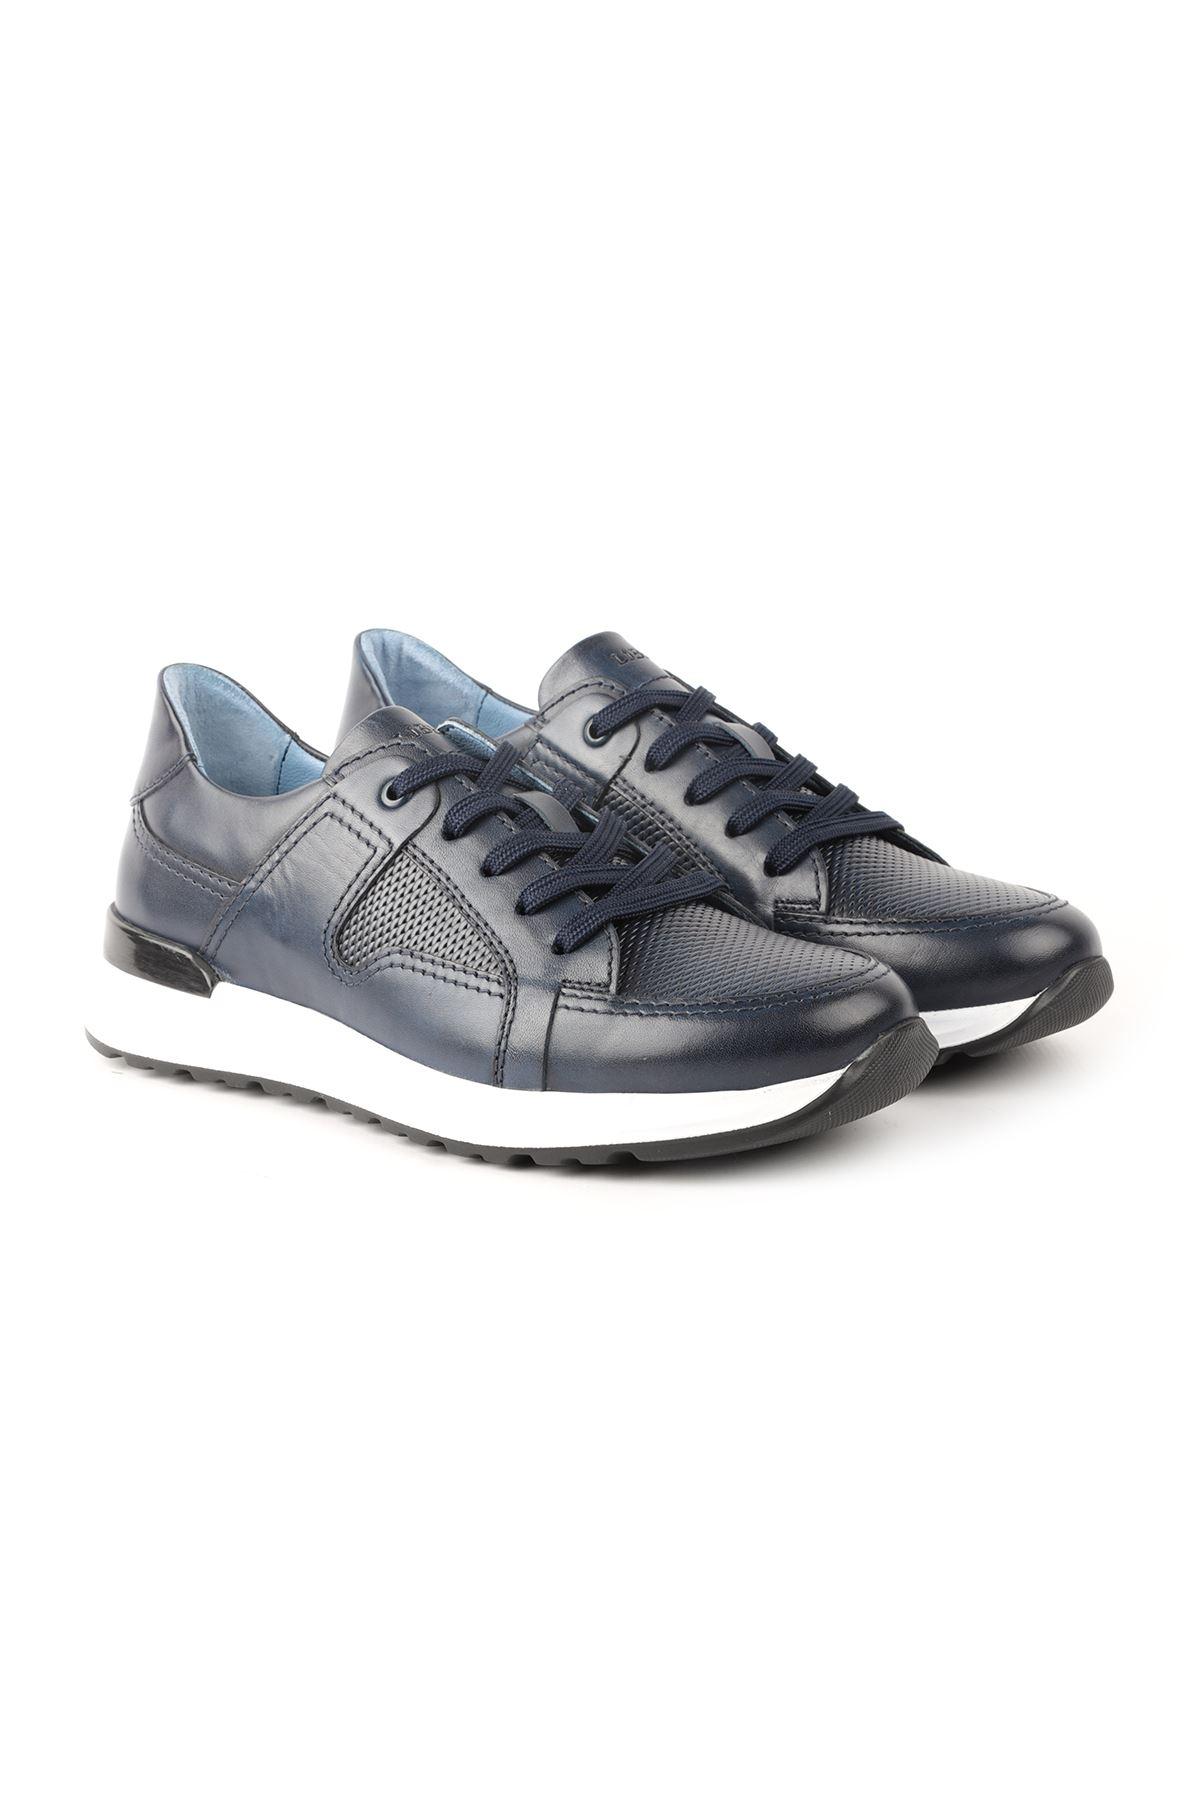 Libero L3741 Lacivert Casual Erkek Ayakkabı